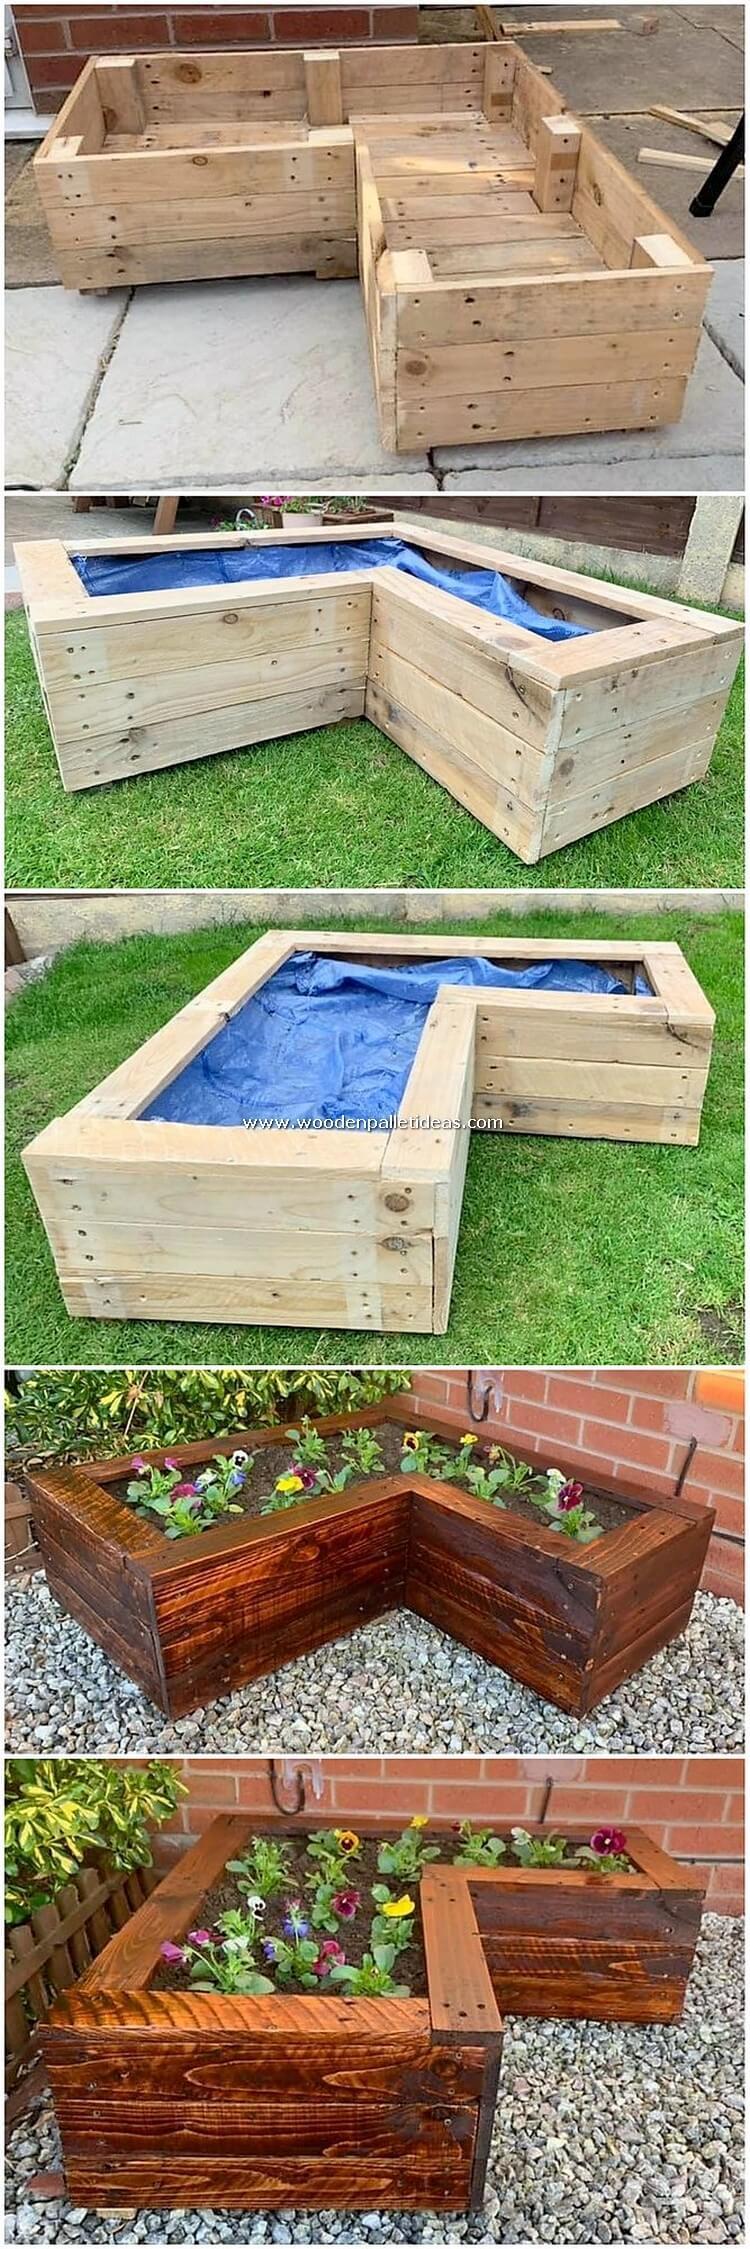 DIY-Pallet-Garden-Planter